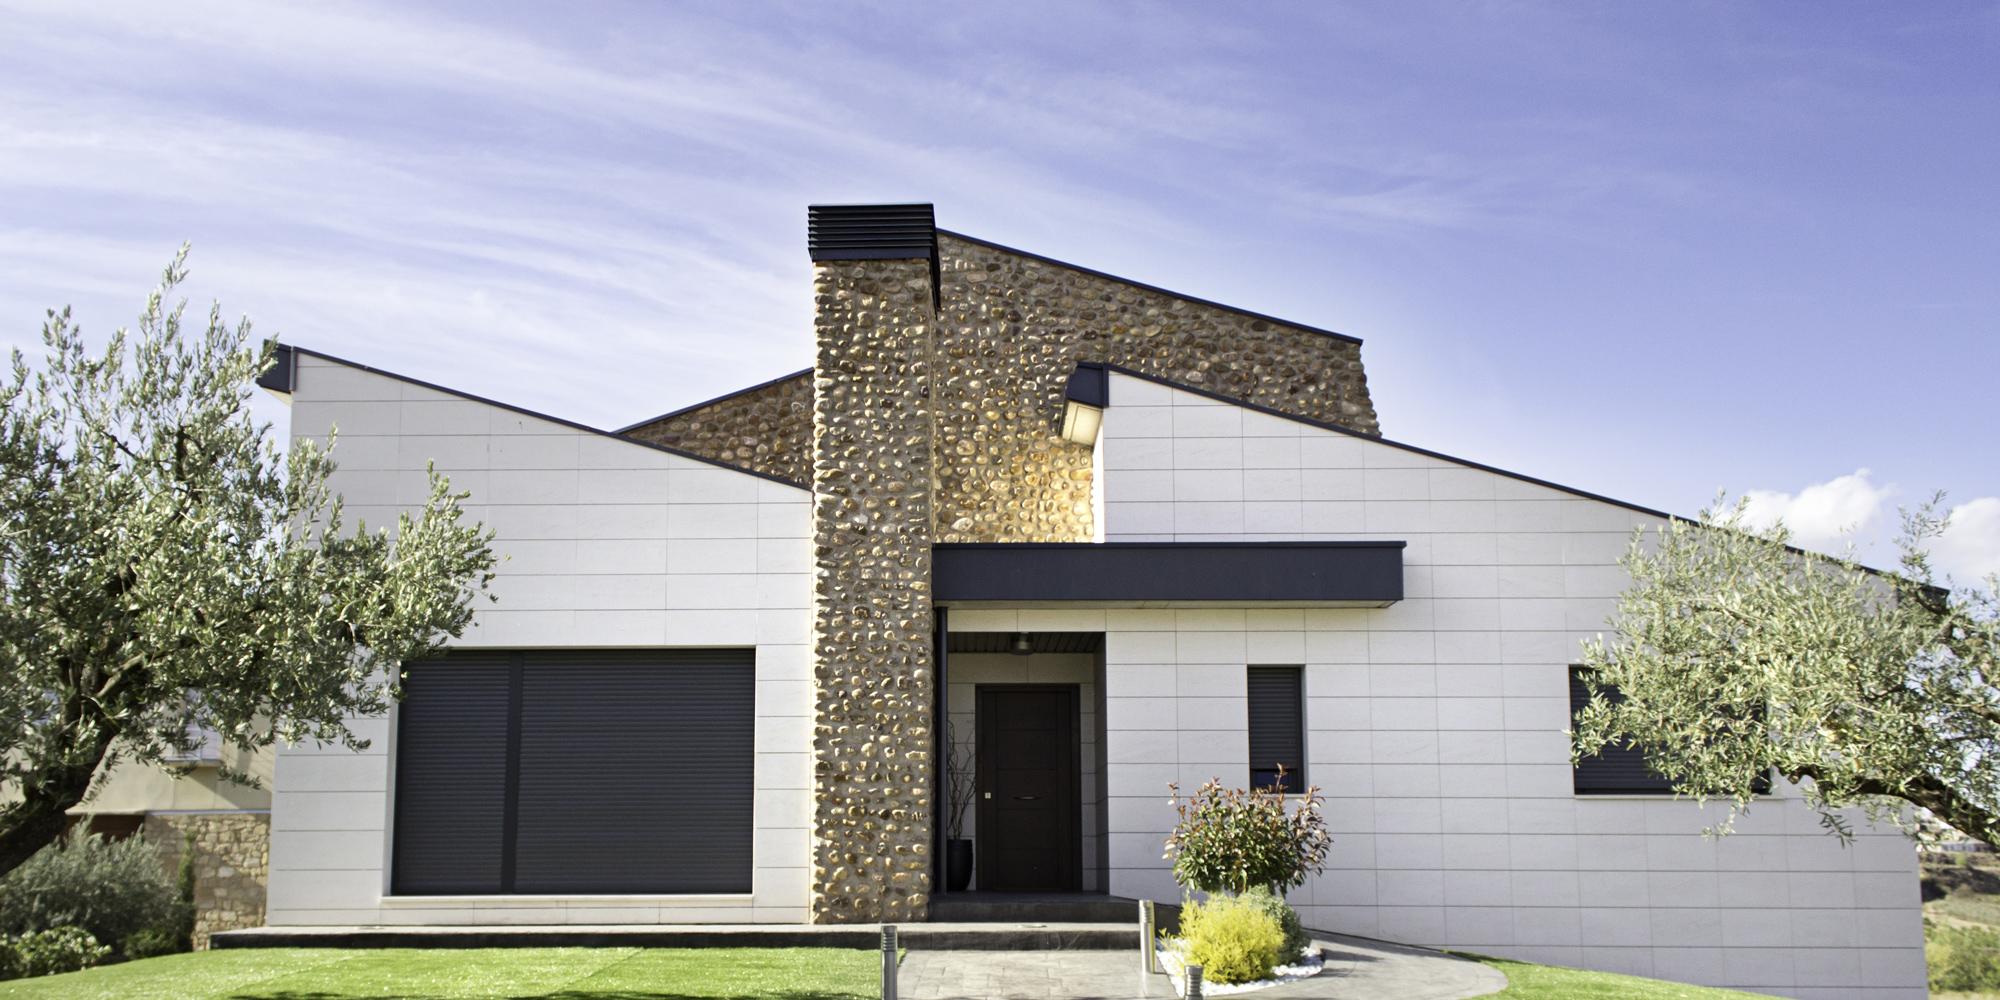 r servoir immo agence immobili re achat et vente appartement ou maison. Black Bedroom Furniture Sets. Home Design Ideas